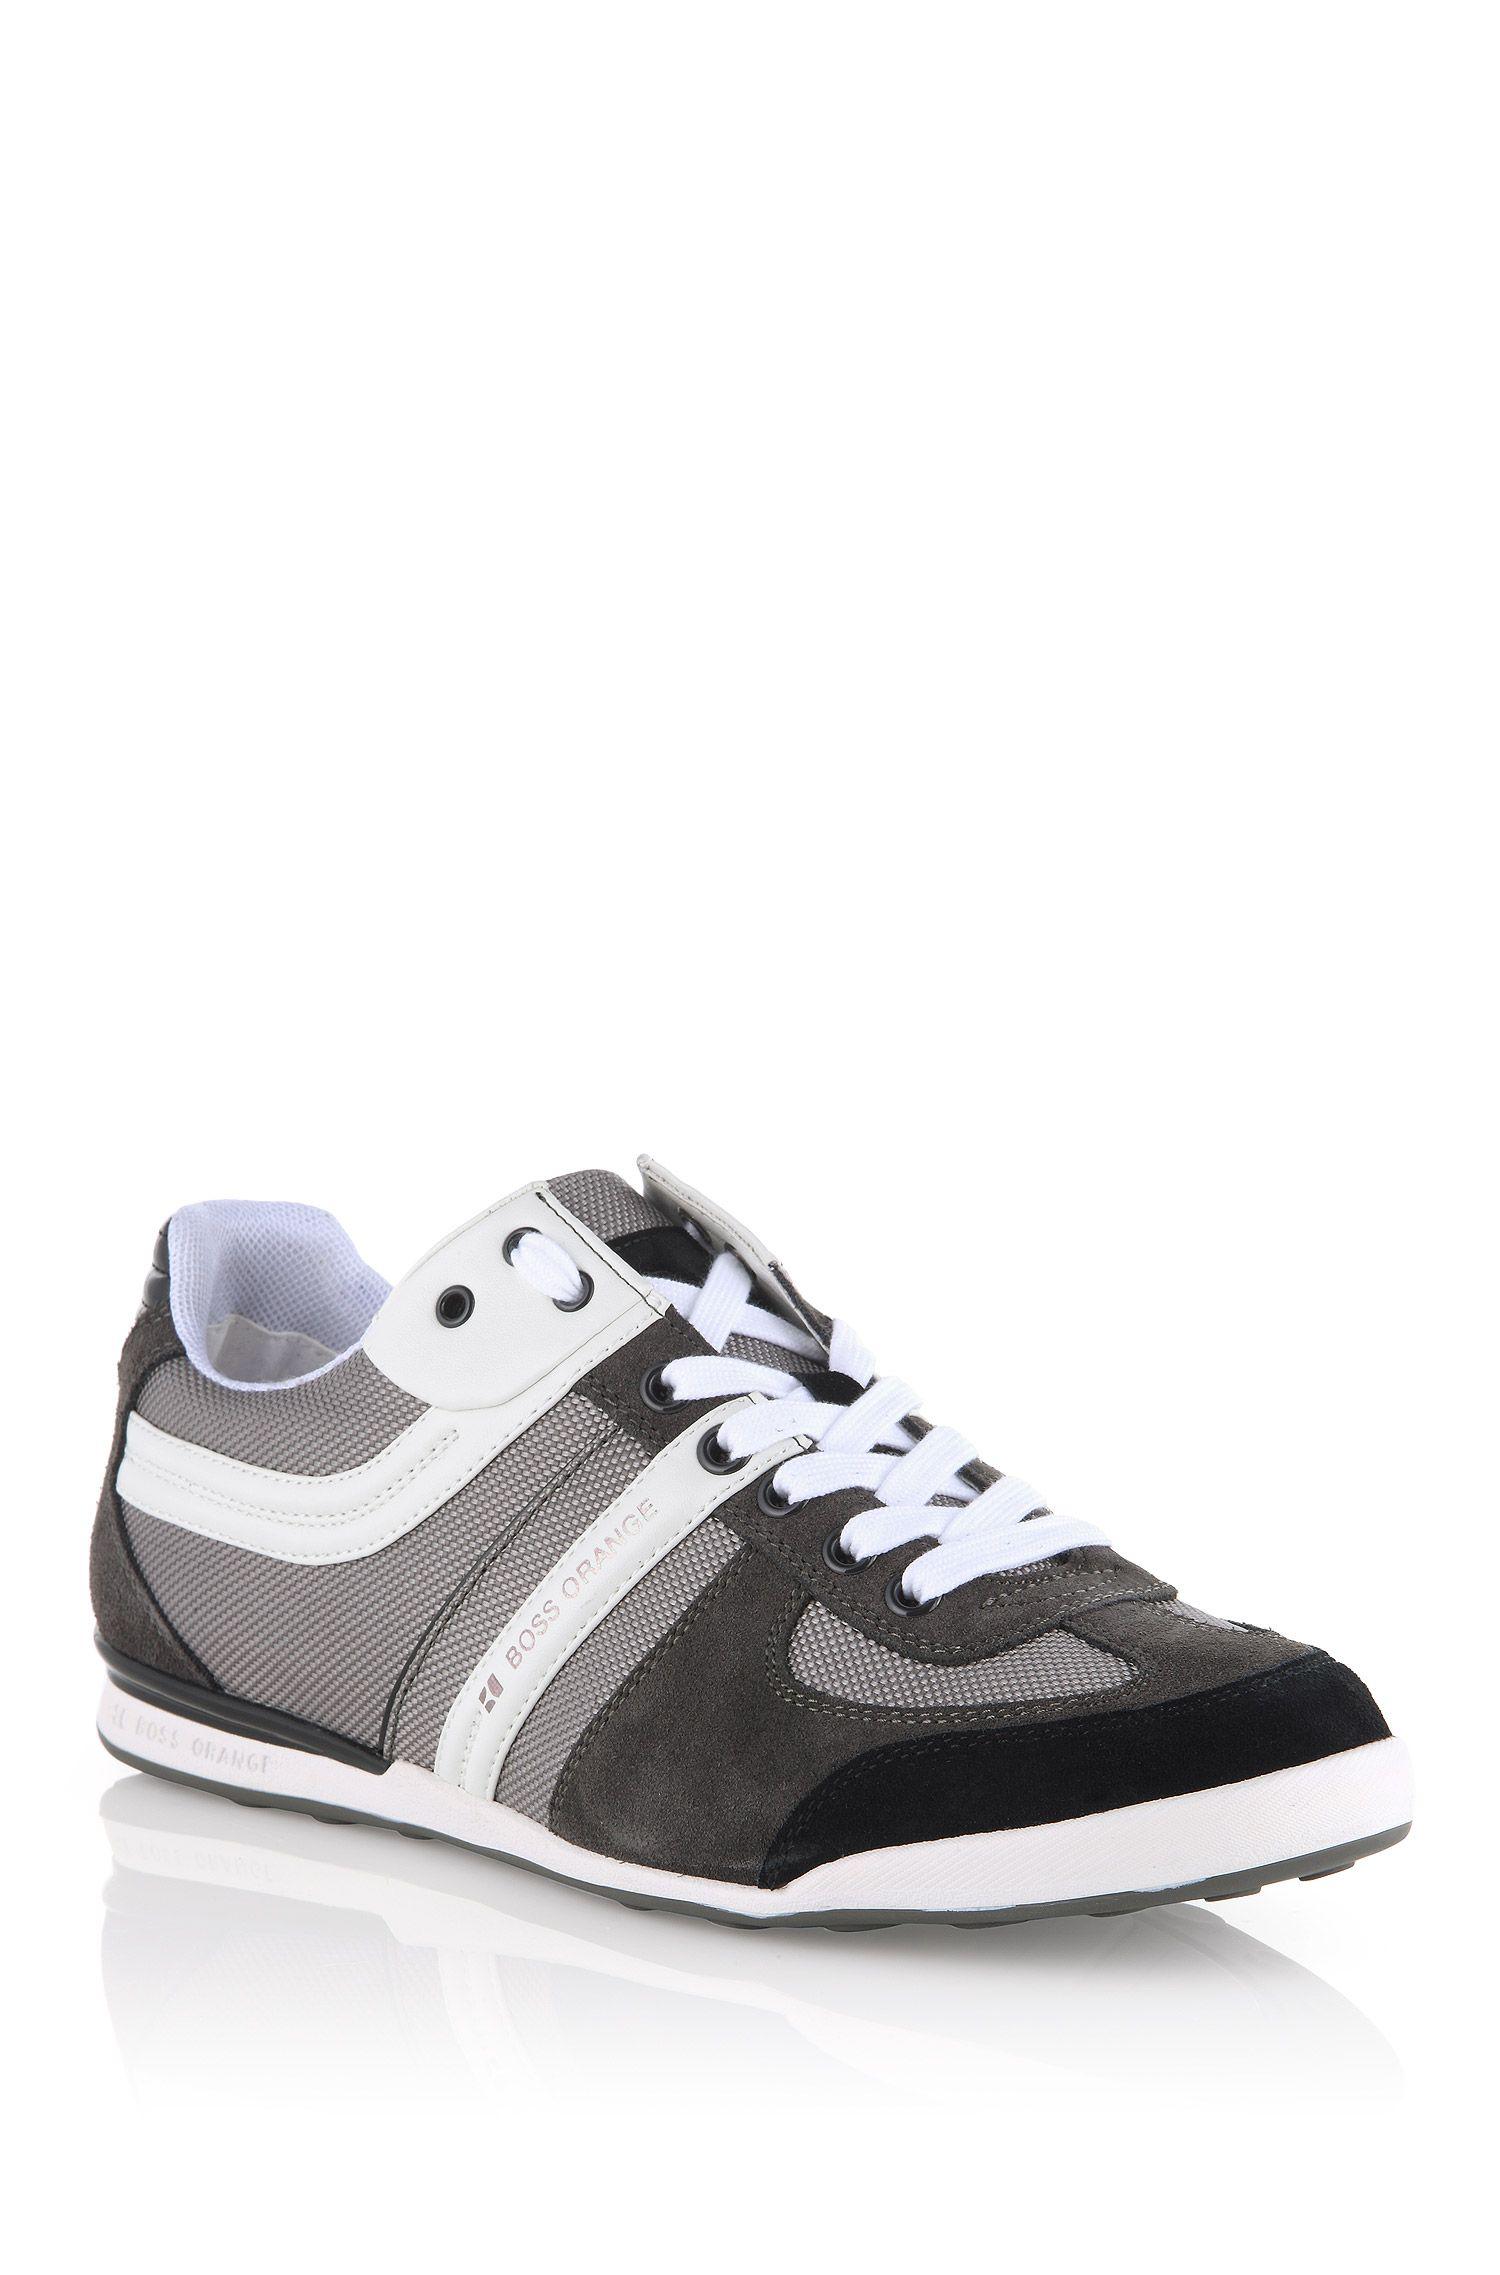 Sneaker ´KEELO` mit Veloursleder und Nylon